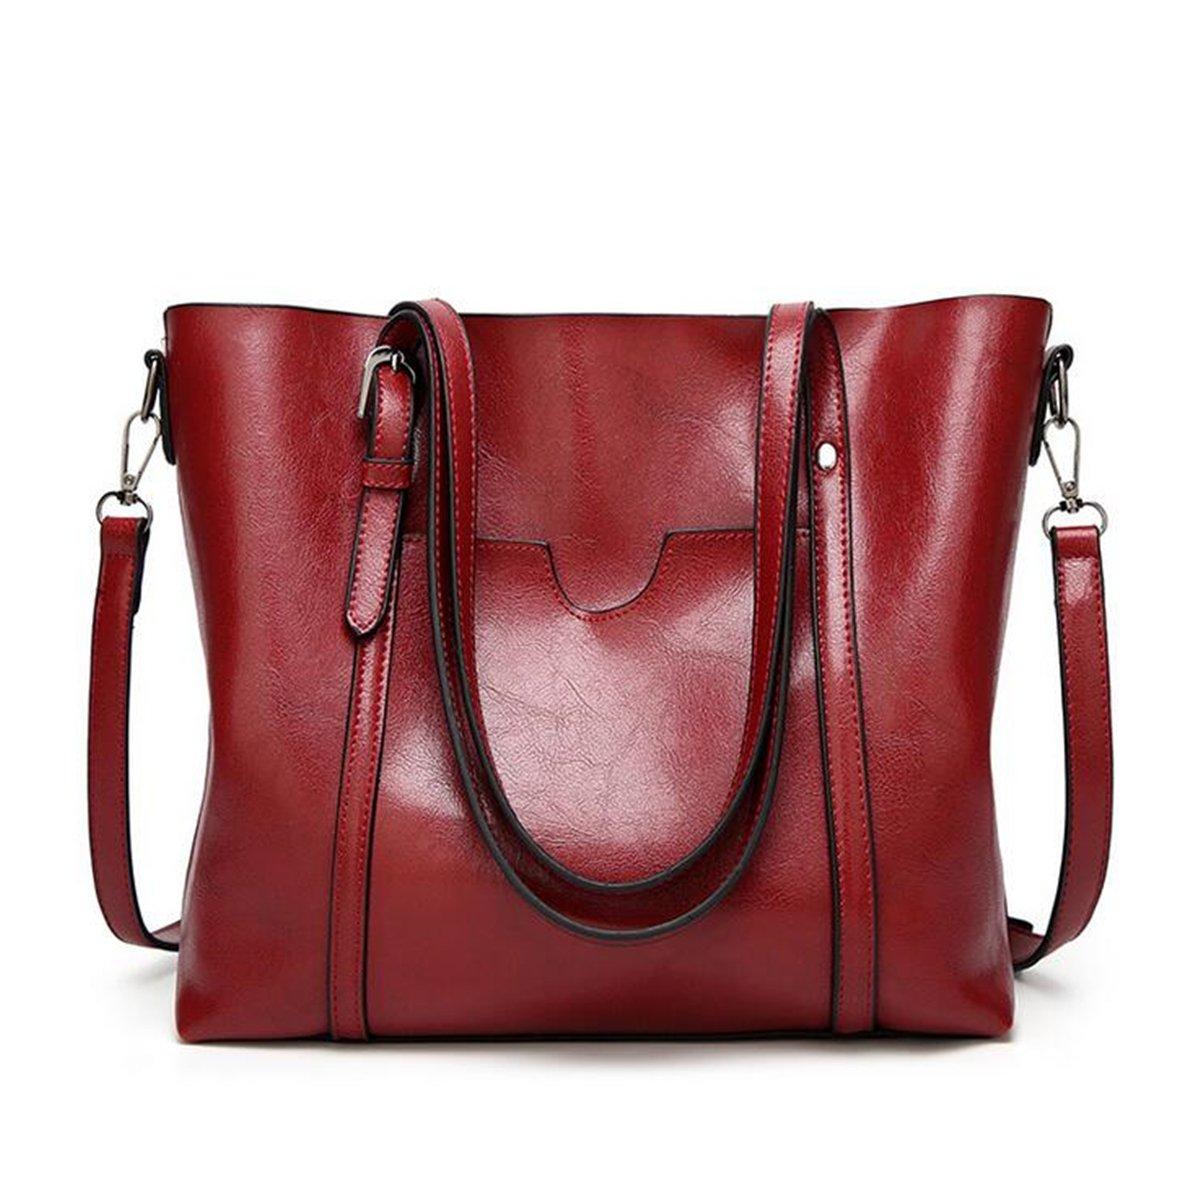 c3bab4a64ce0 ... OURBAGDrseewd19912 OURBAG Women Top Handle Satchel Handbags Shoulder  Bag Tote Purse OURBAGDrseewd19912 ...